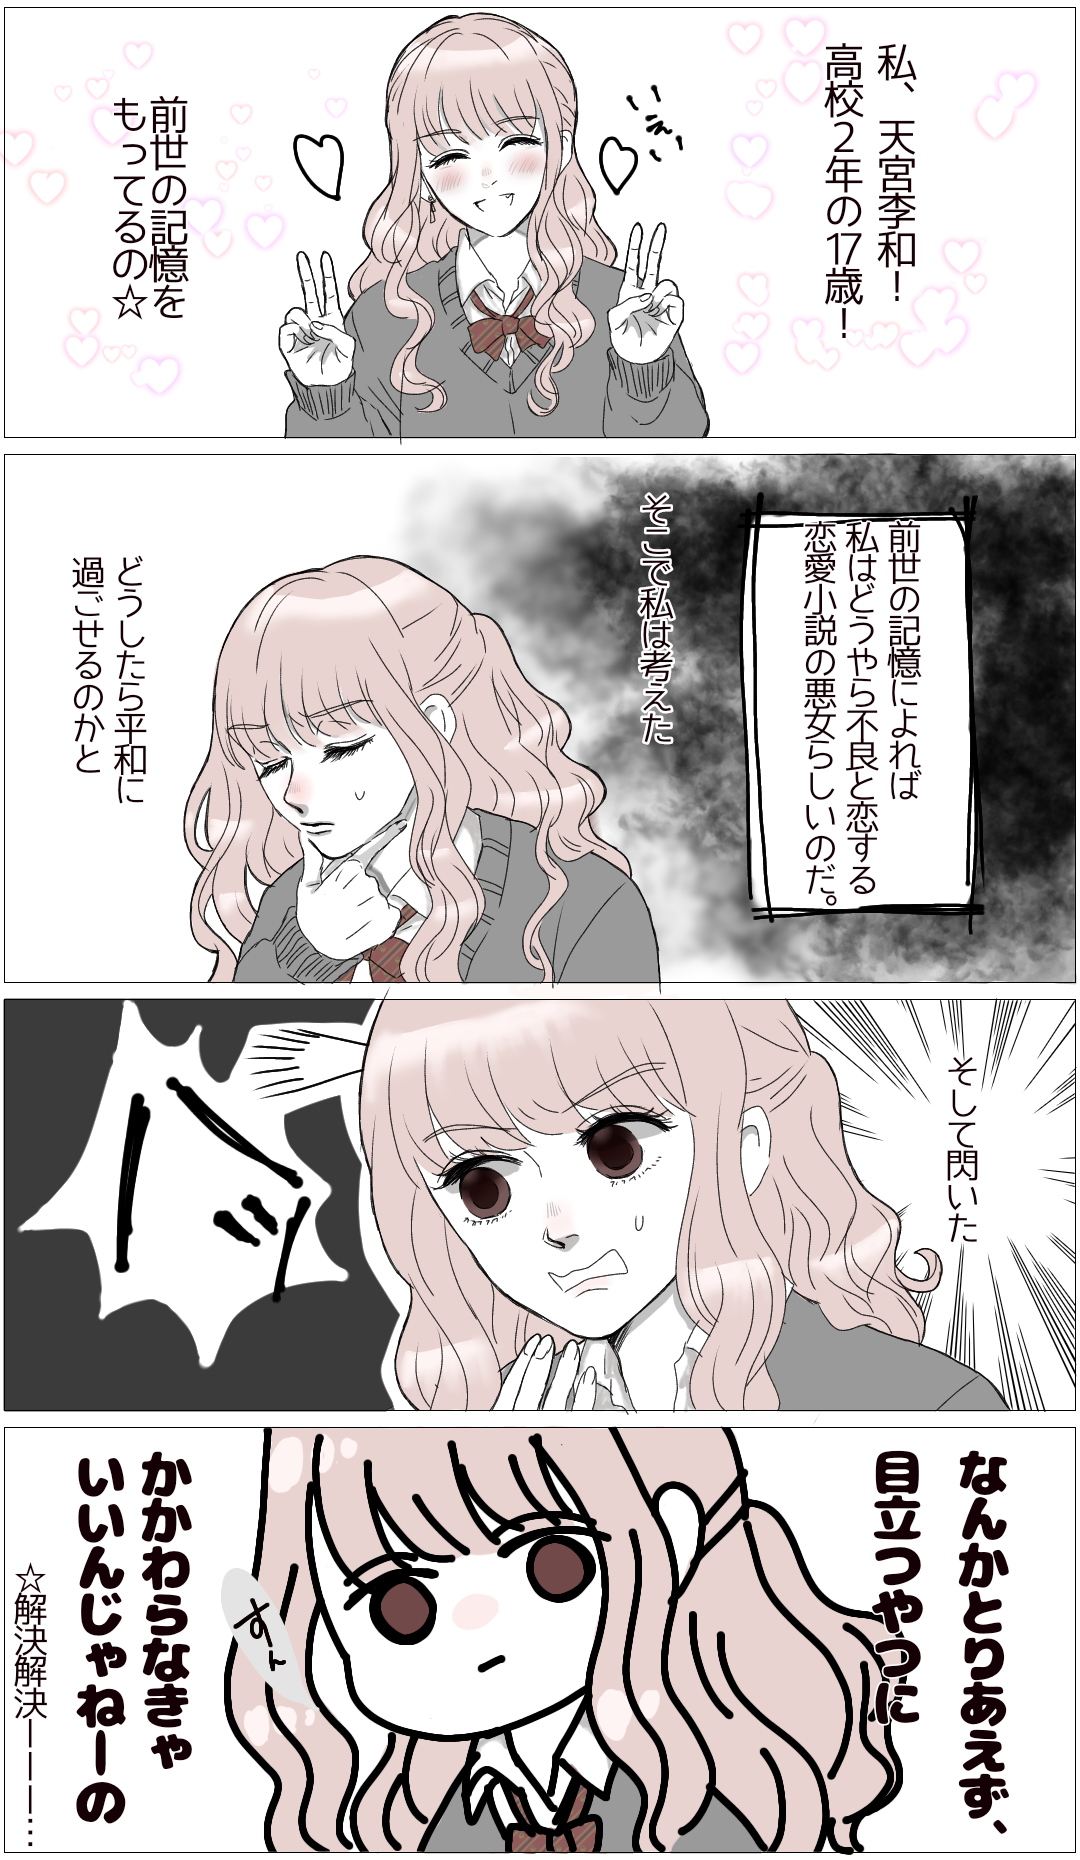 I 恋愛 の 小説 らんど 魔法